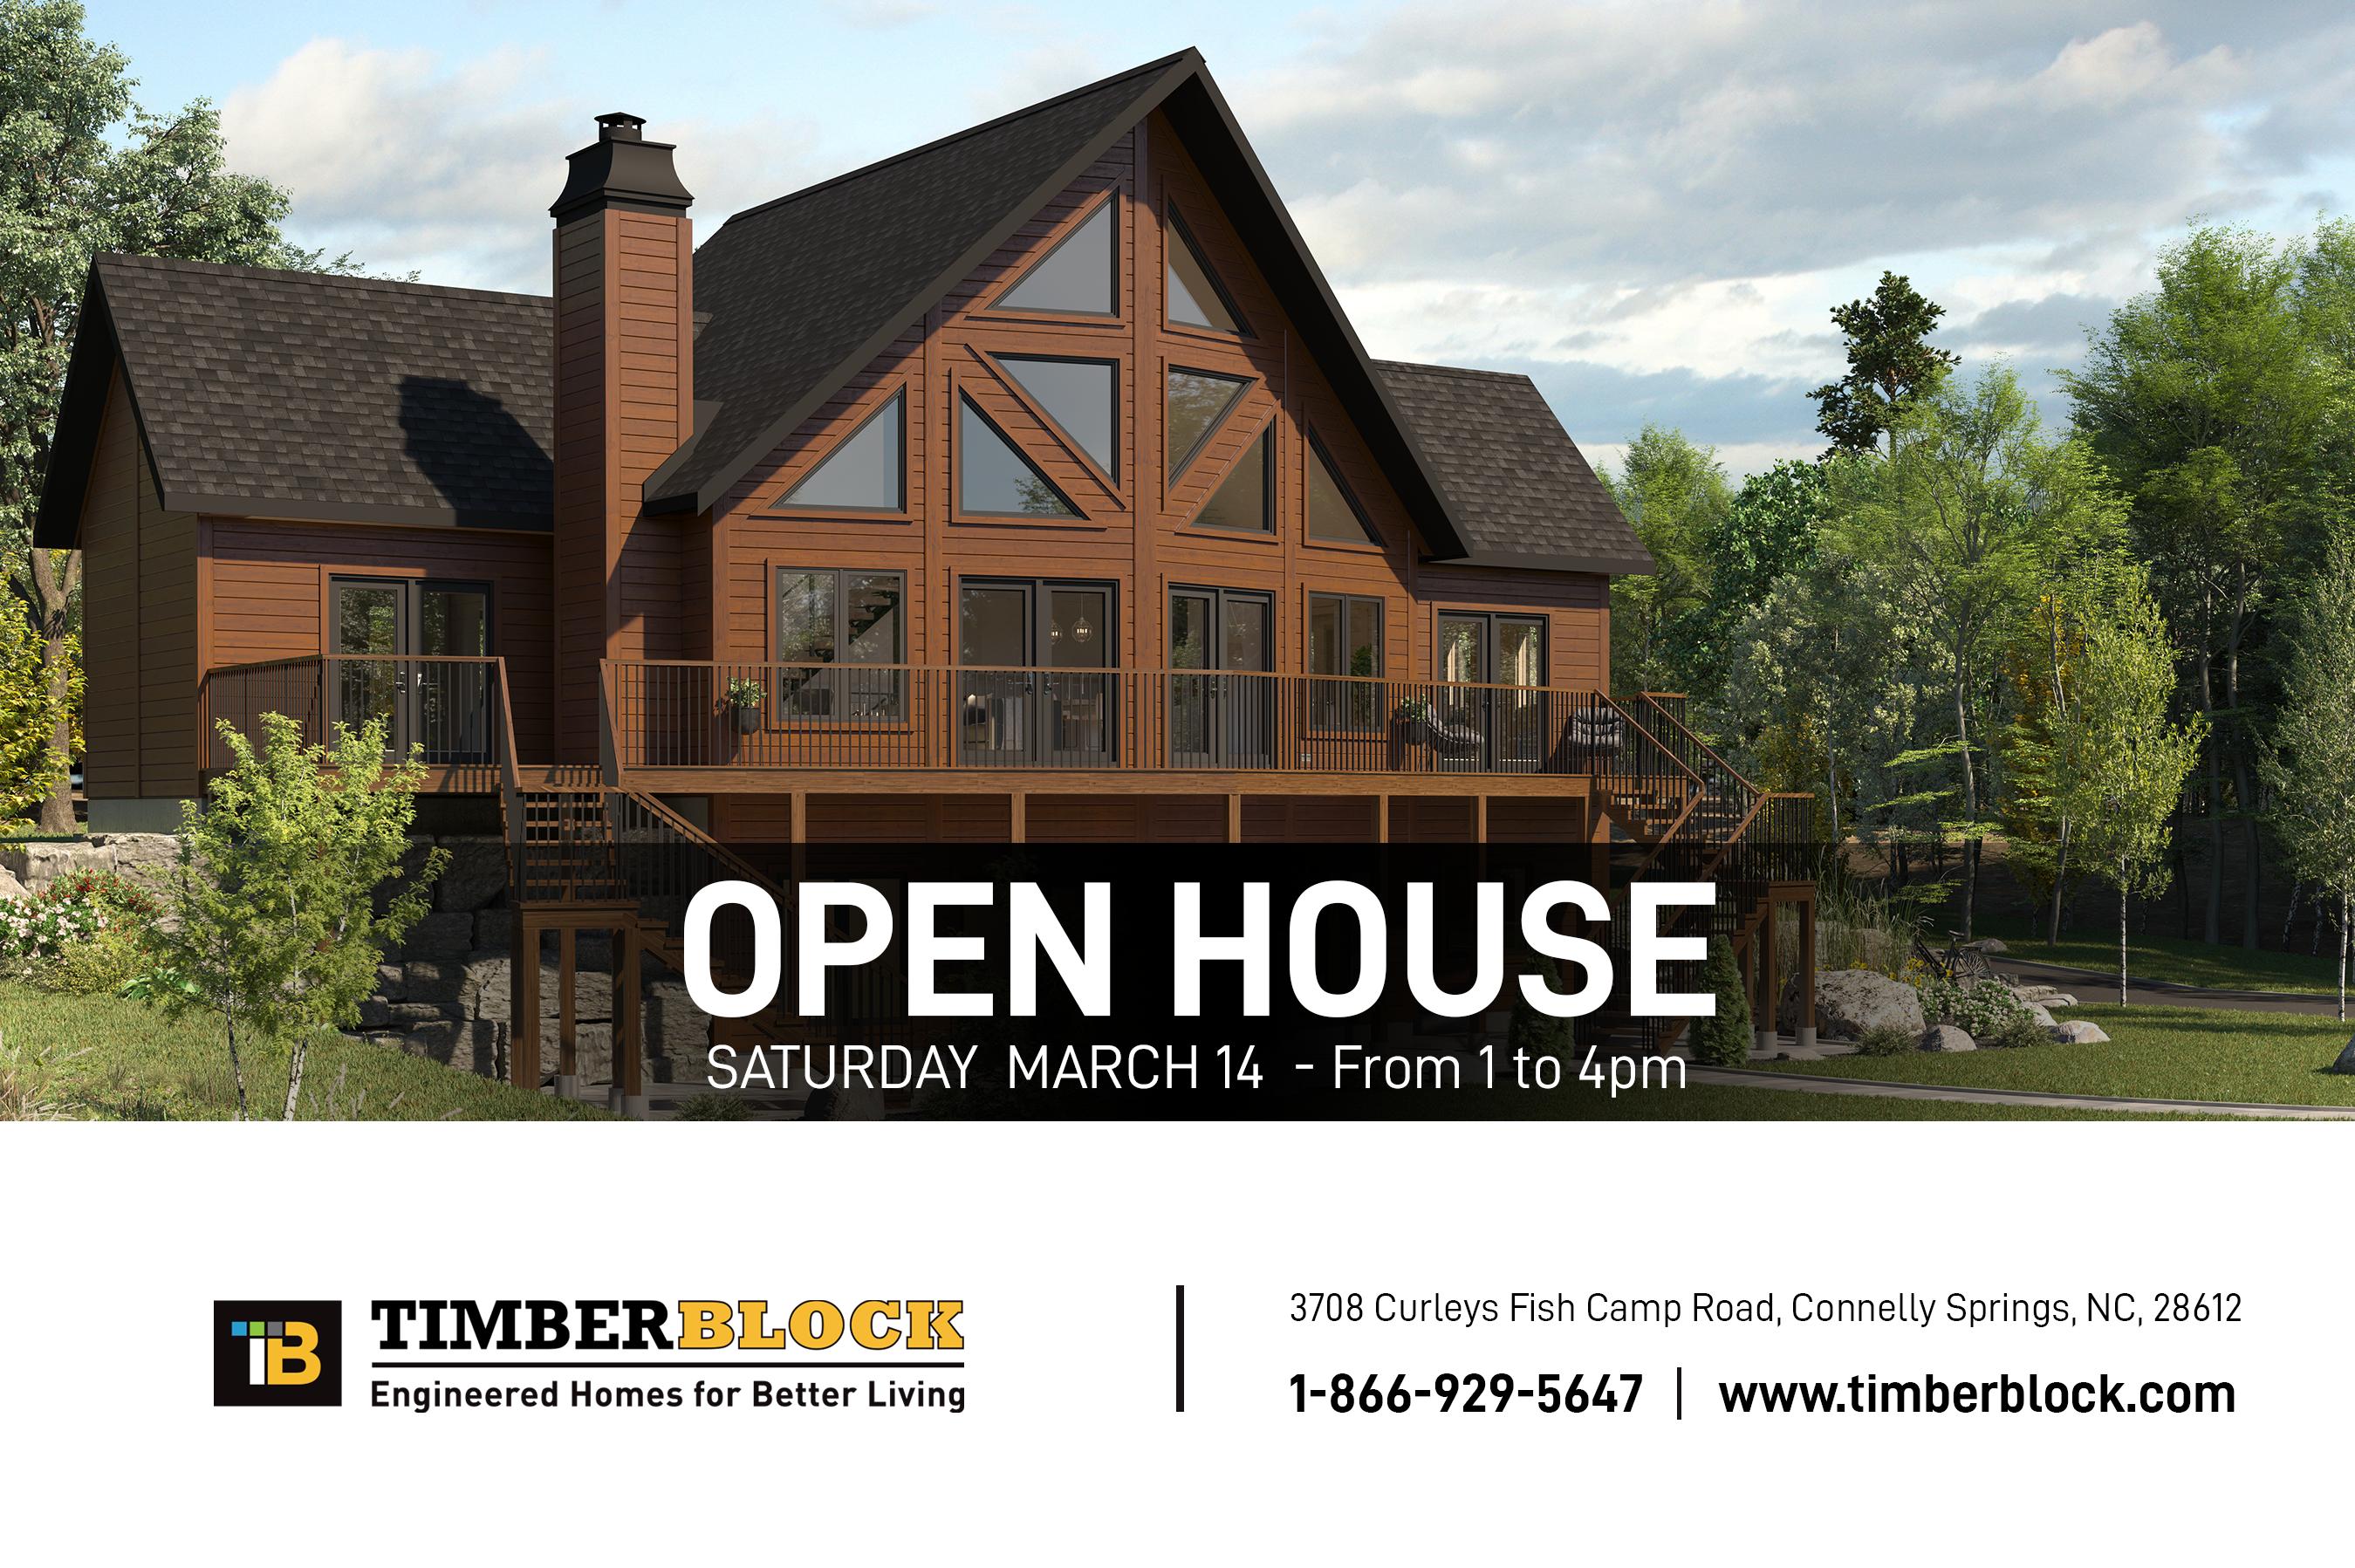 North Carolina Open House Timber Block